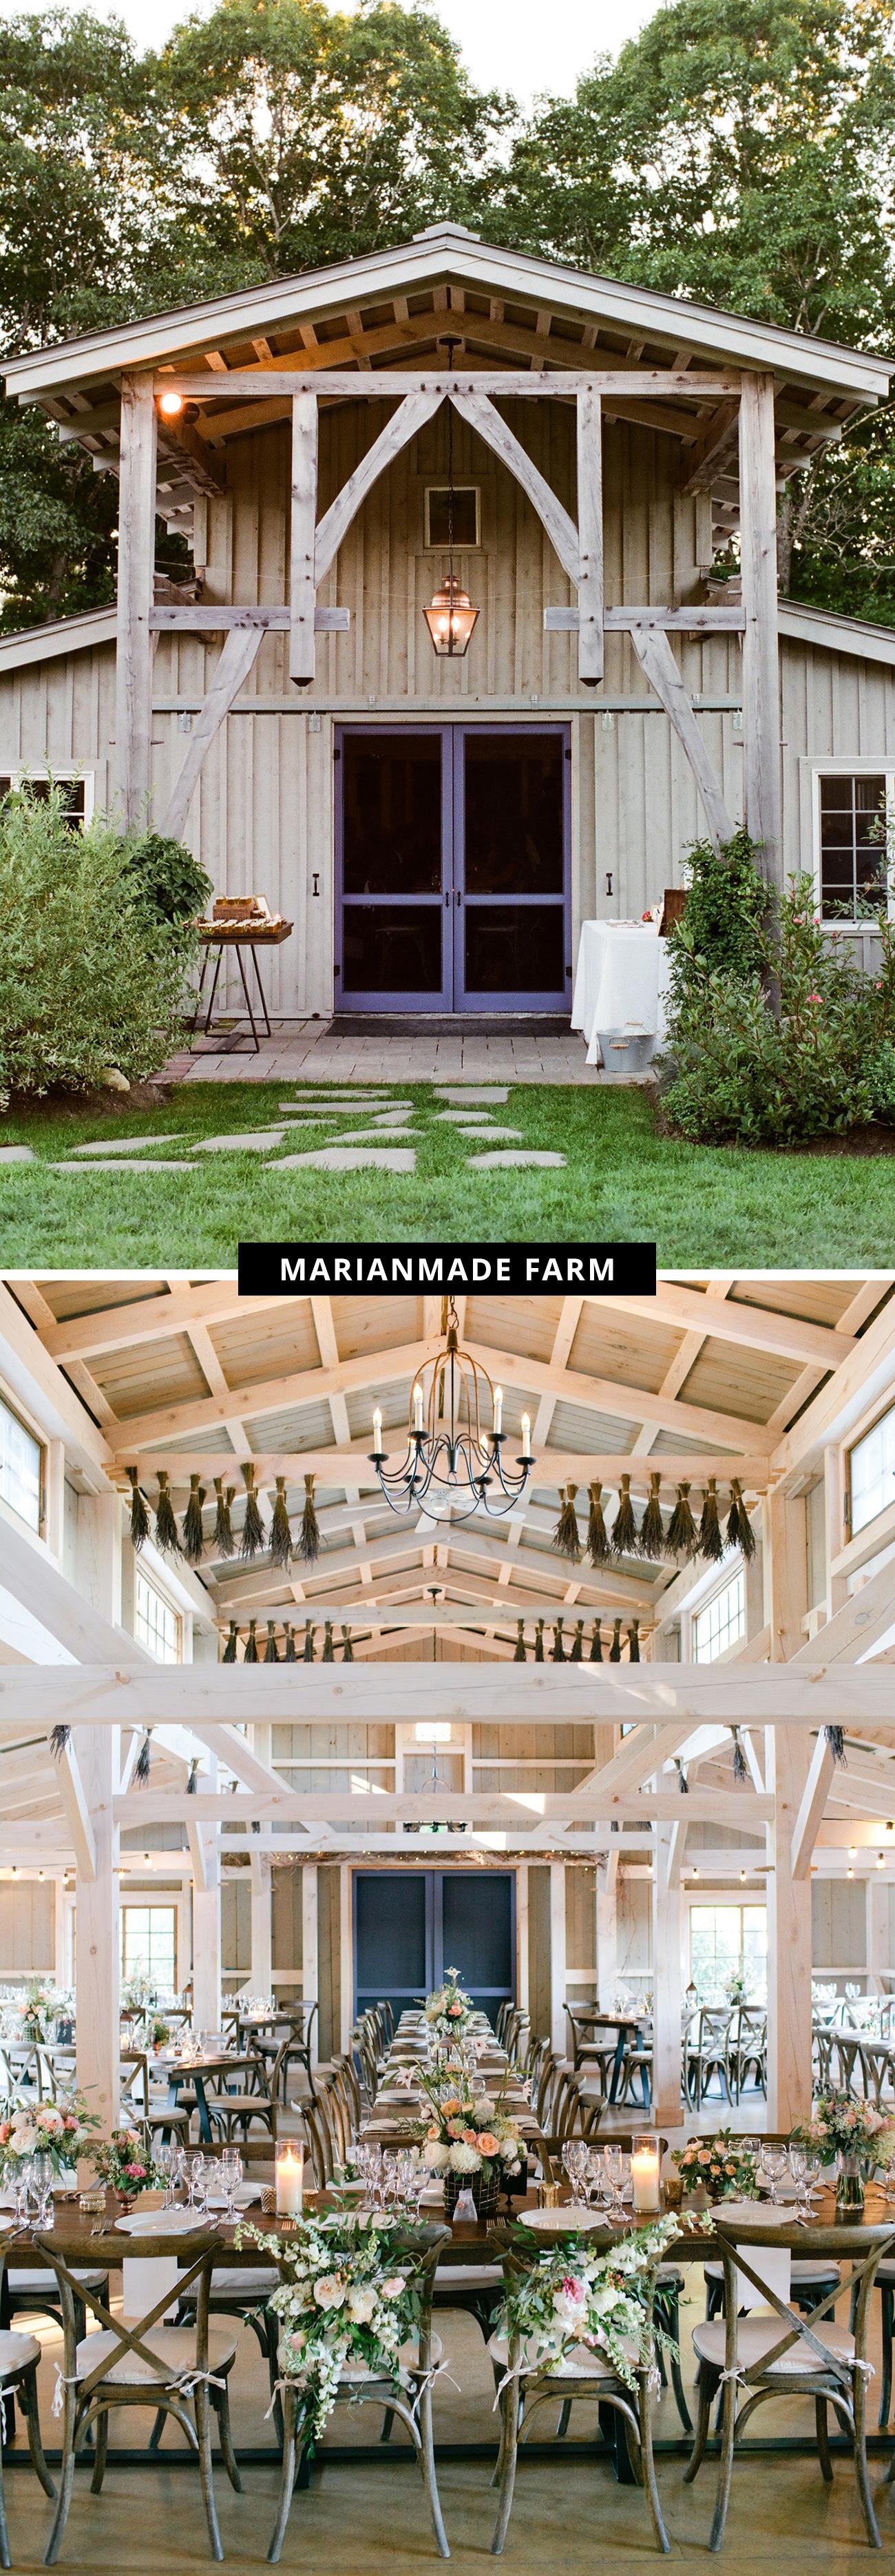 Marianmade Farm wedding venue